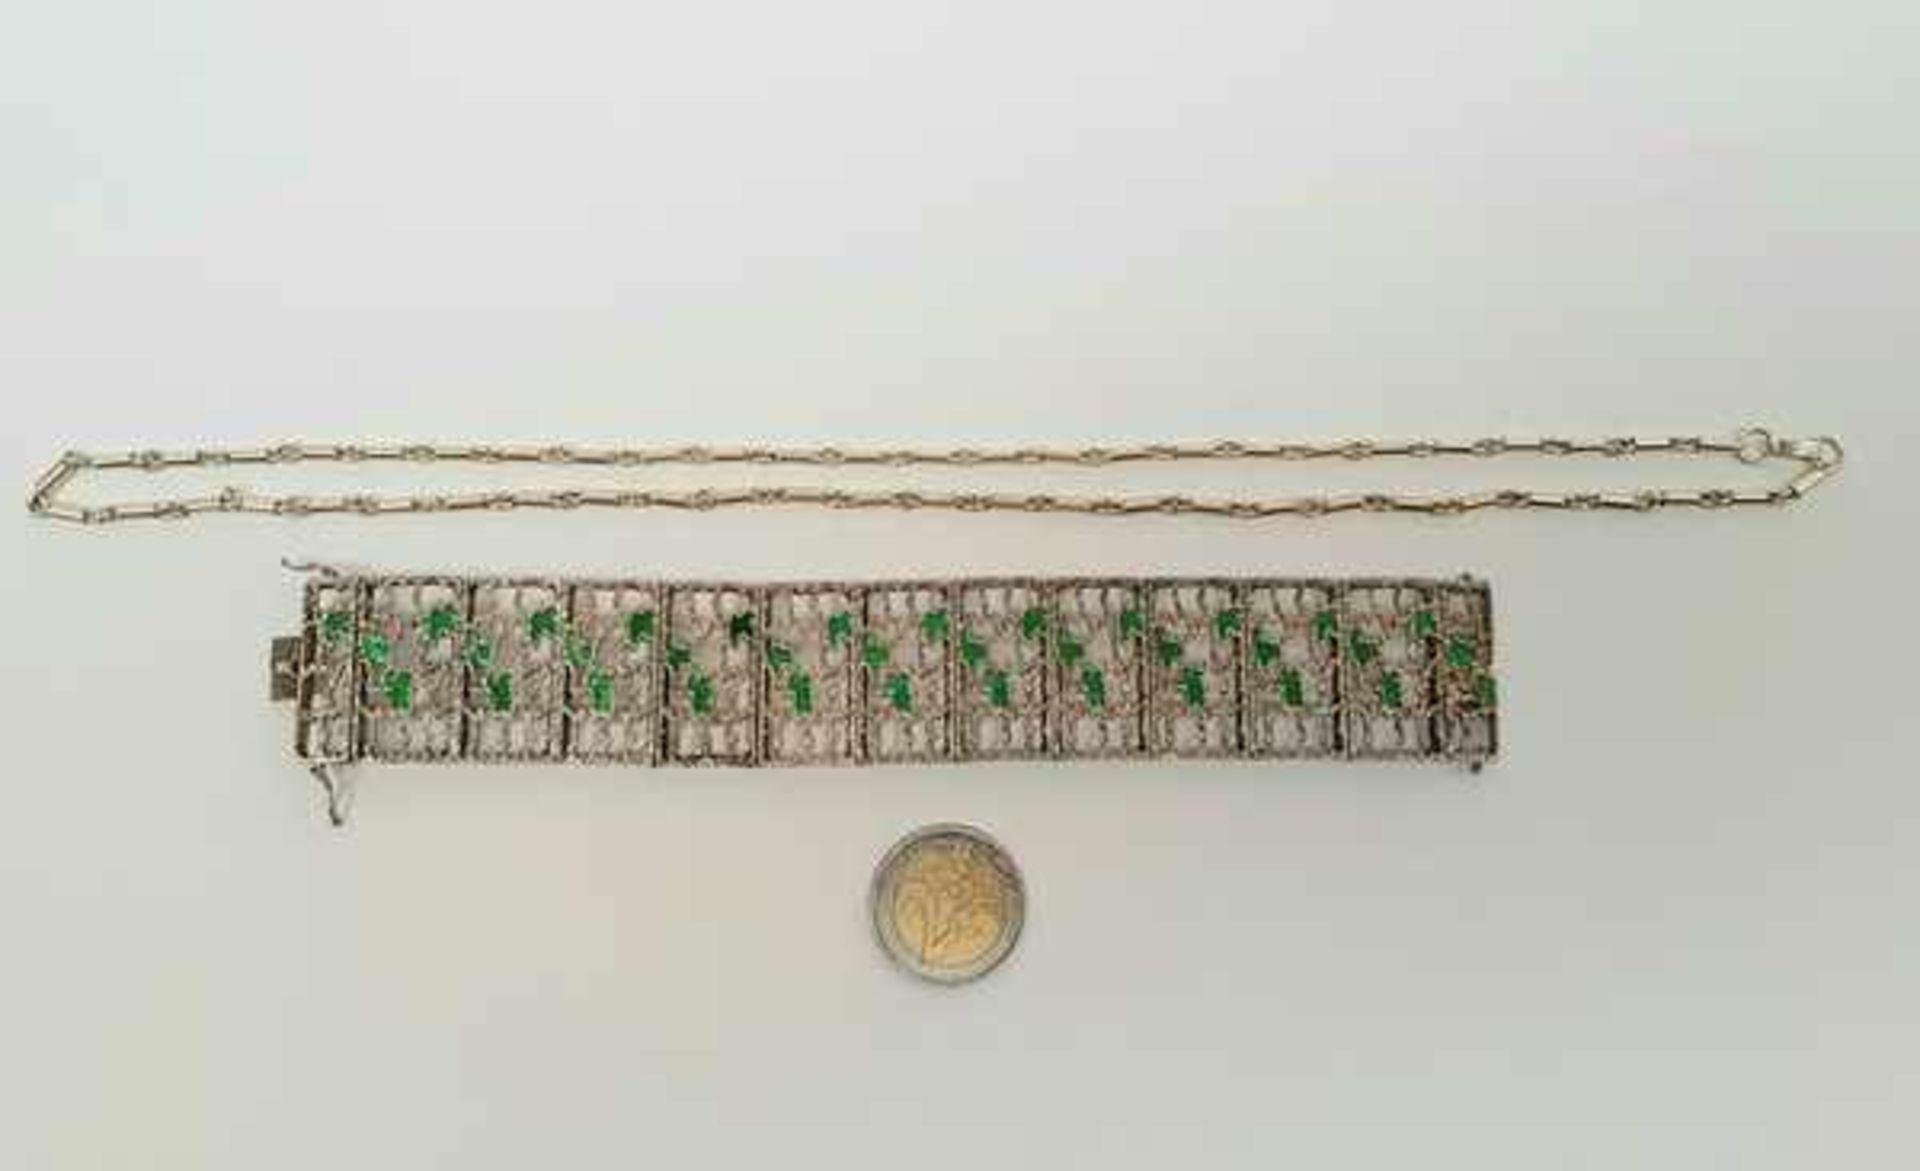 (Sieraden) Zilver + emaille. Armband en halsketting. o.a. Mexico - Image 2 of 7